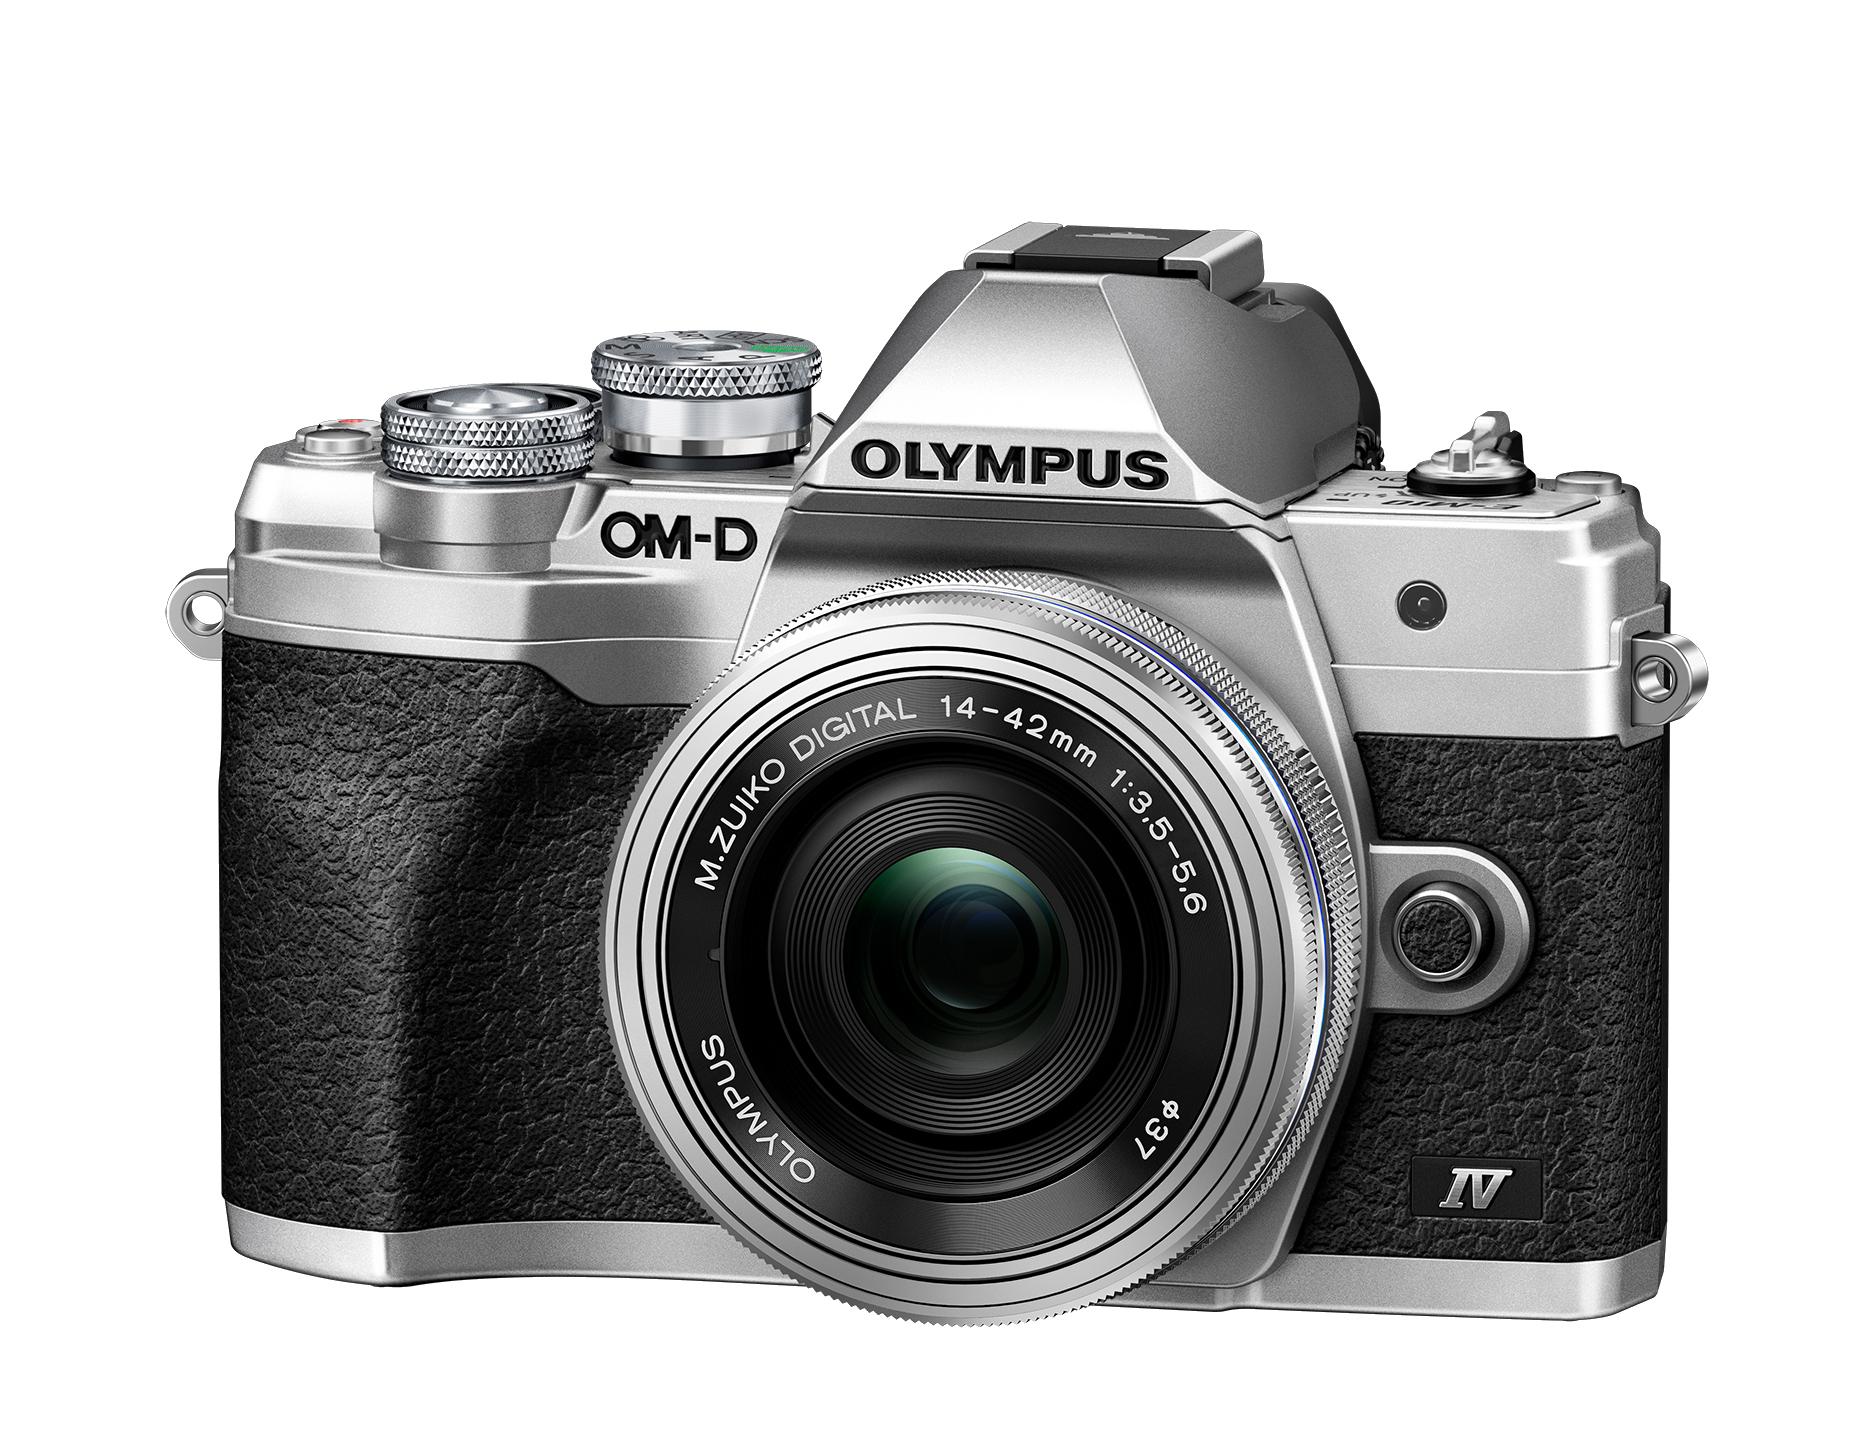 Olympus OM-D E-M10 M IV+ED 3,5-5,6/14-42 mm EZ silber Kamera-Kit 109838